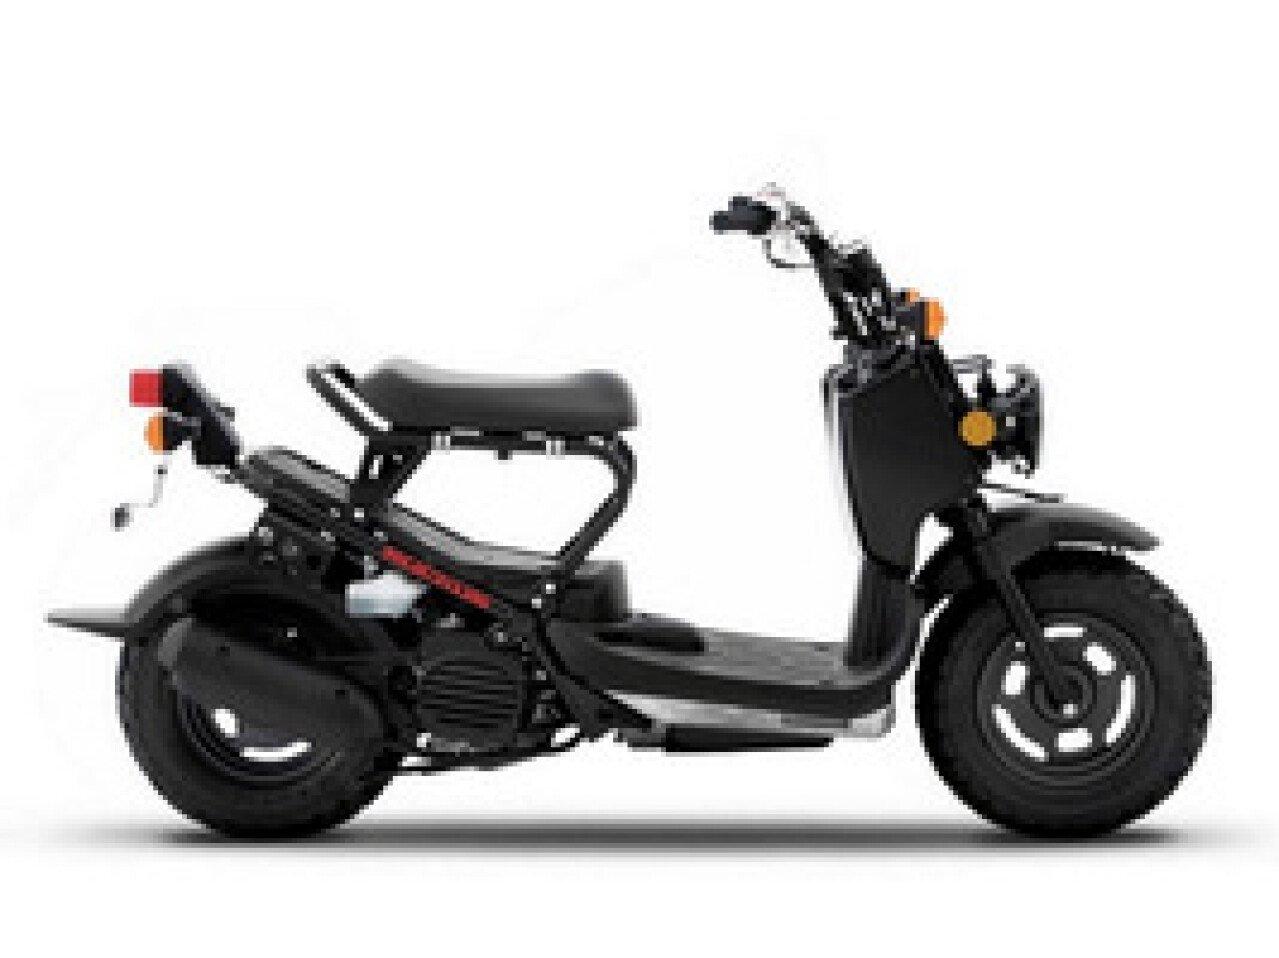 2017 Honda Ruckus For Sale Near Macon Georgia 31210 Motorcycles